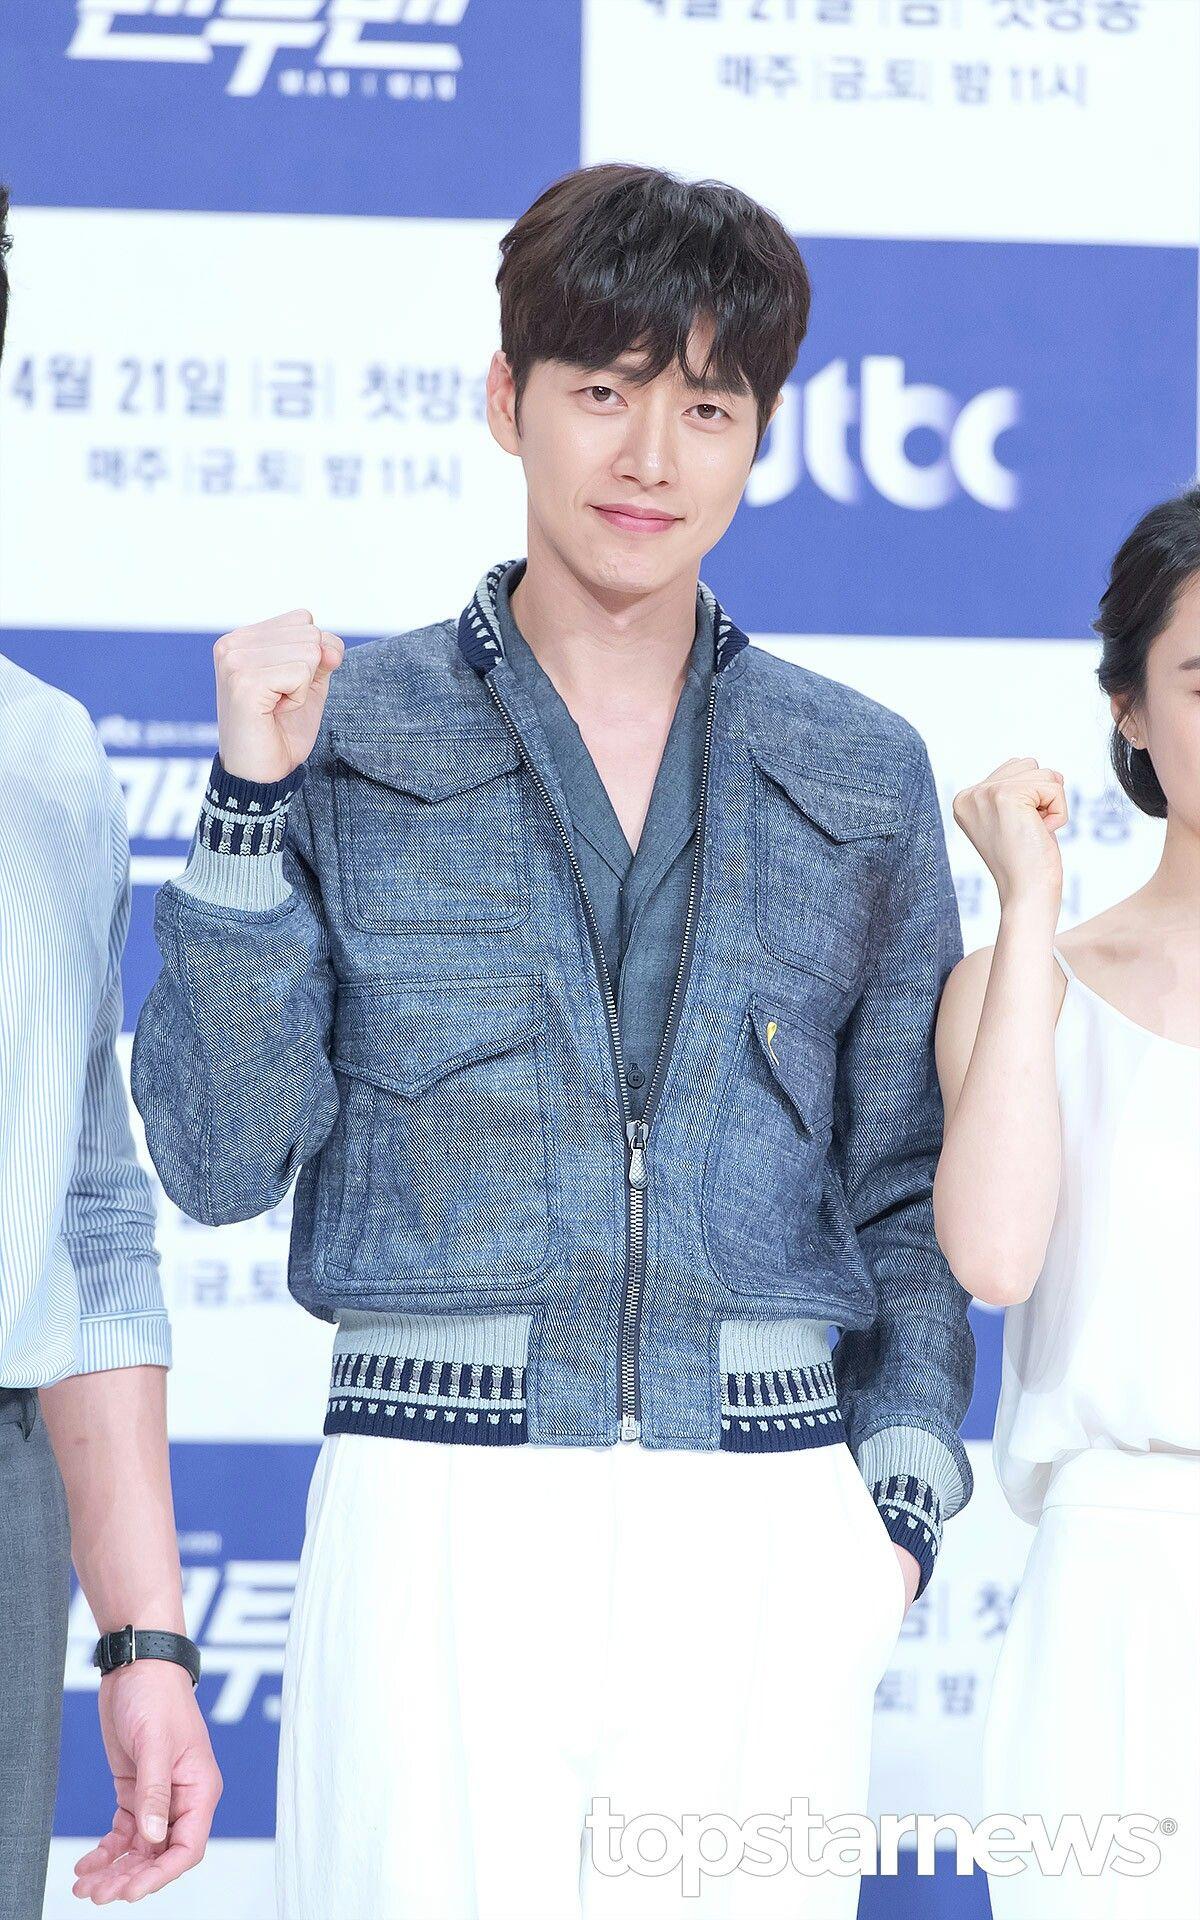 park hae jin 박해진 朴海鎮 man to man 맨투맨 press conference april 18, 2017